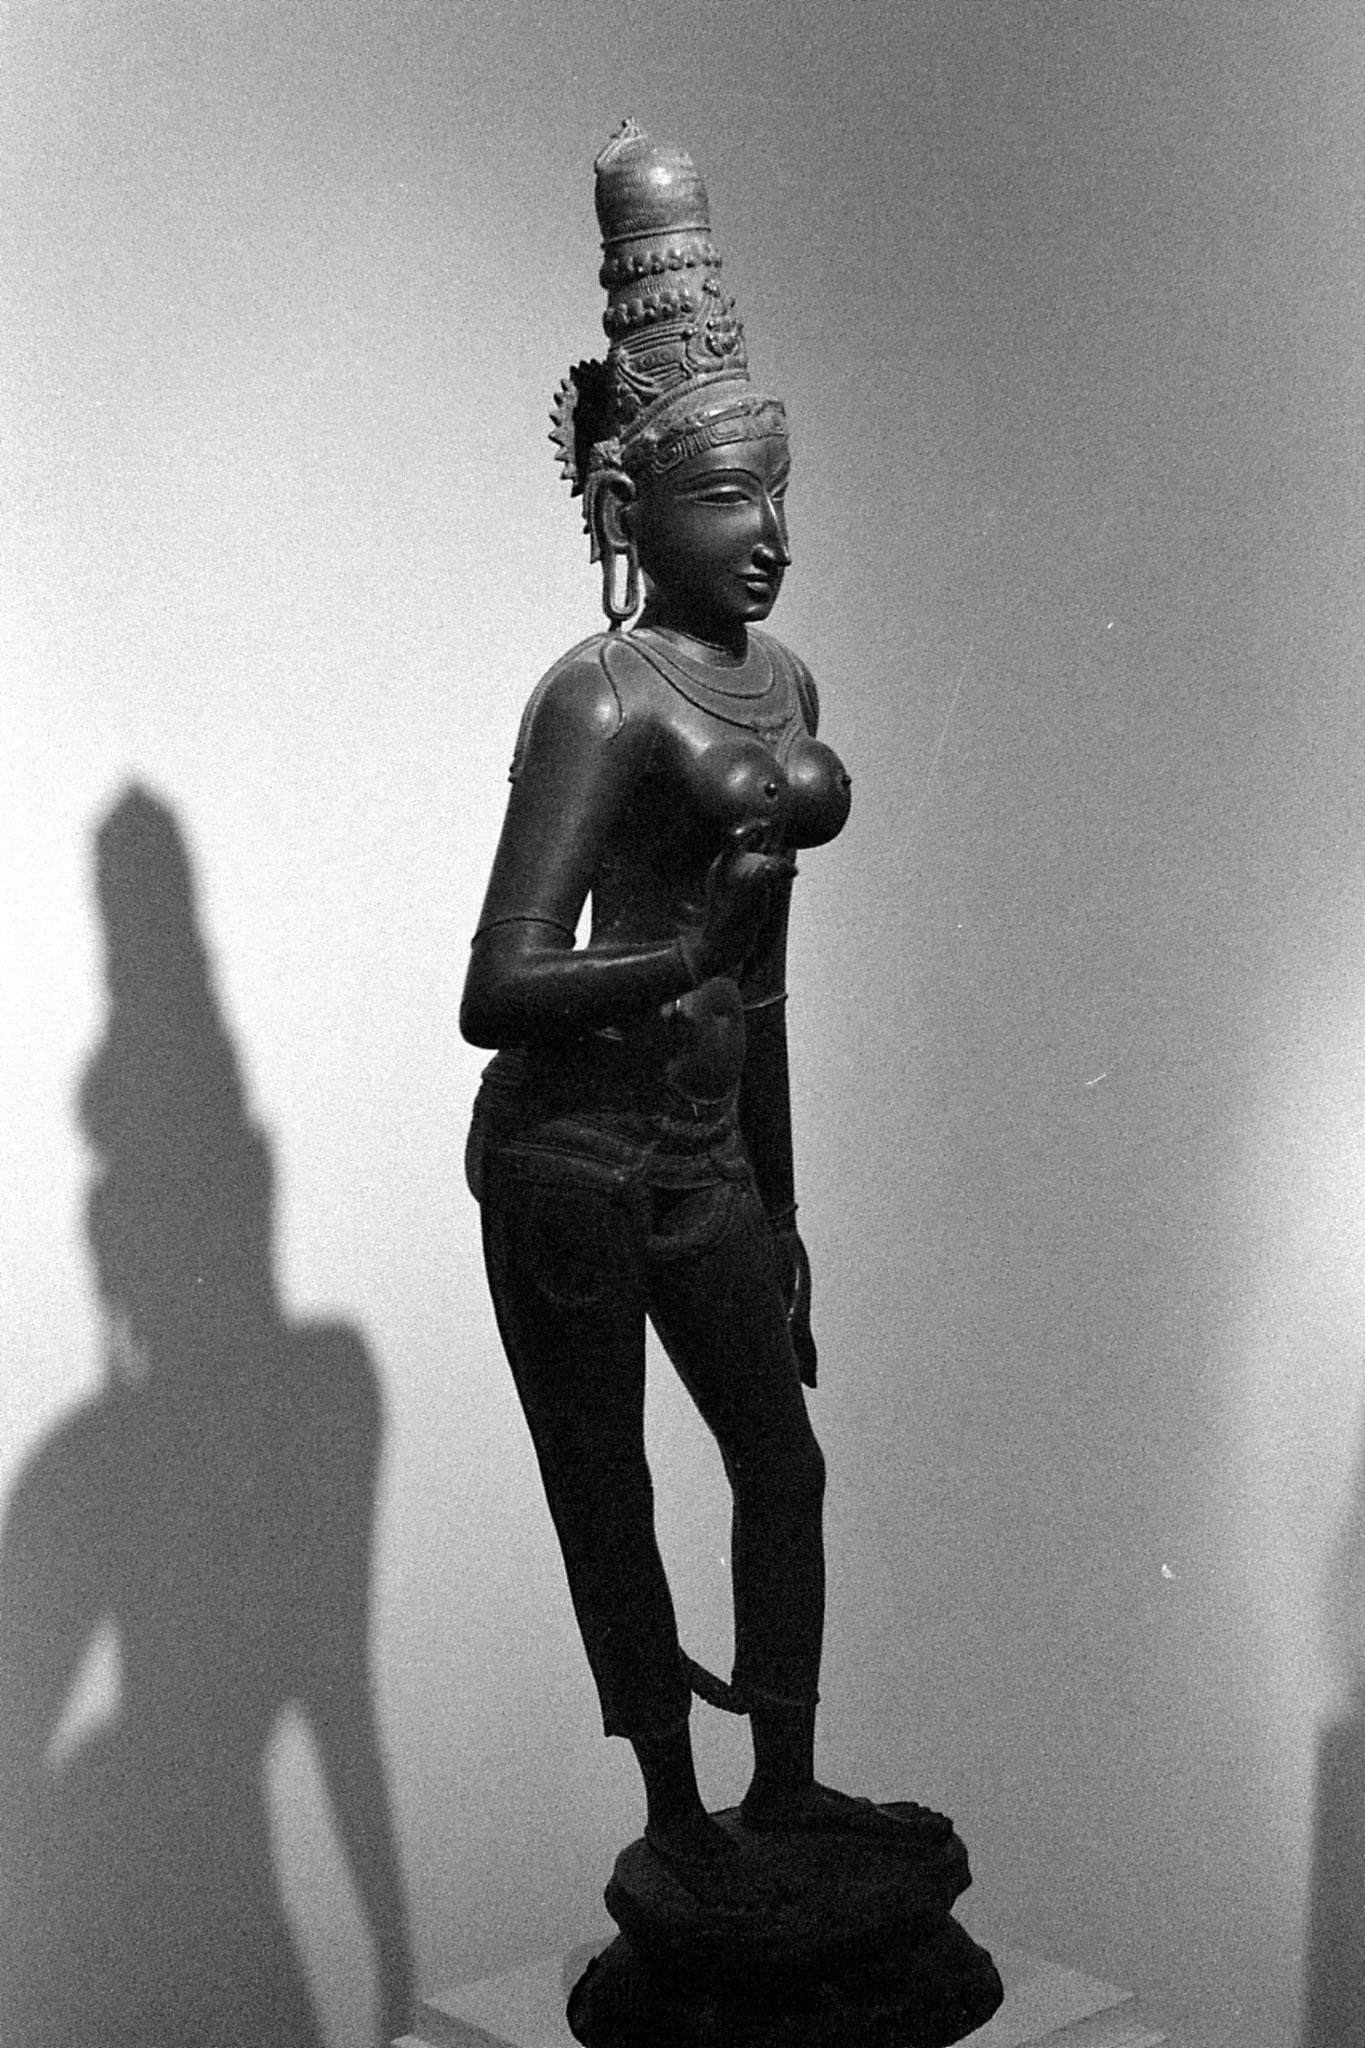 26/11/1989: 27: National Museum, Devi